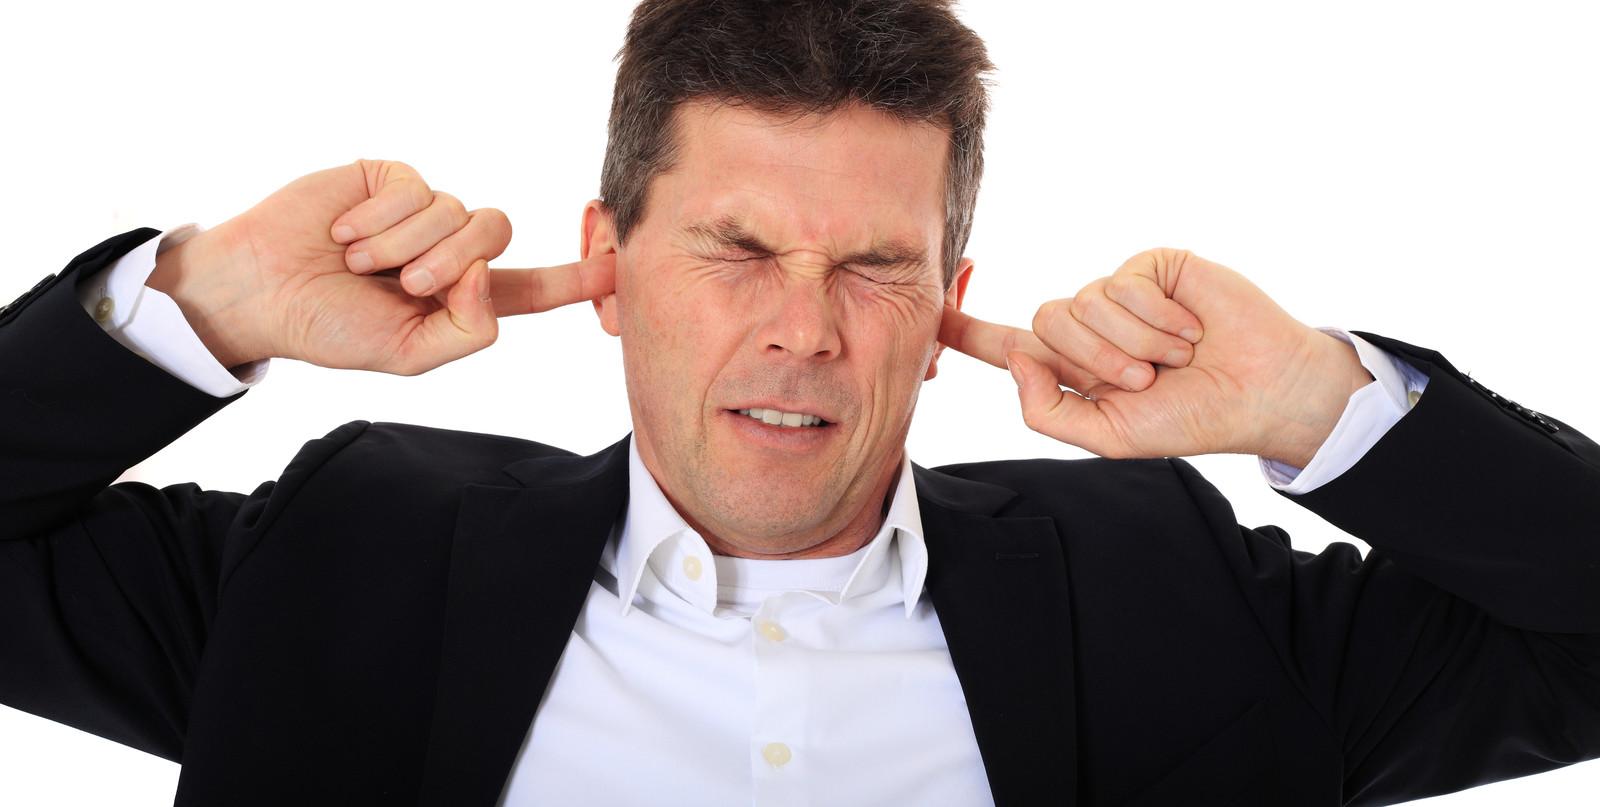 Tinnitus Treatment Tips